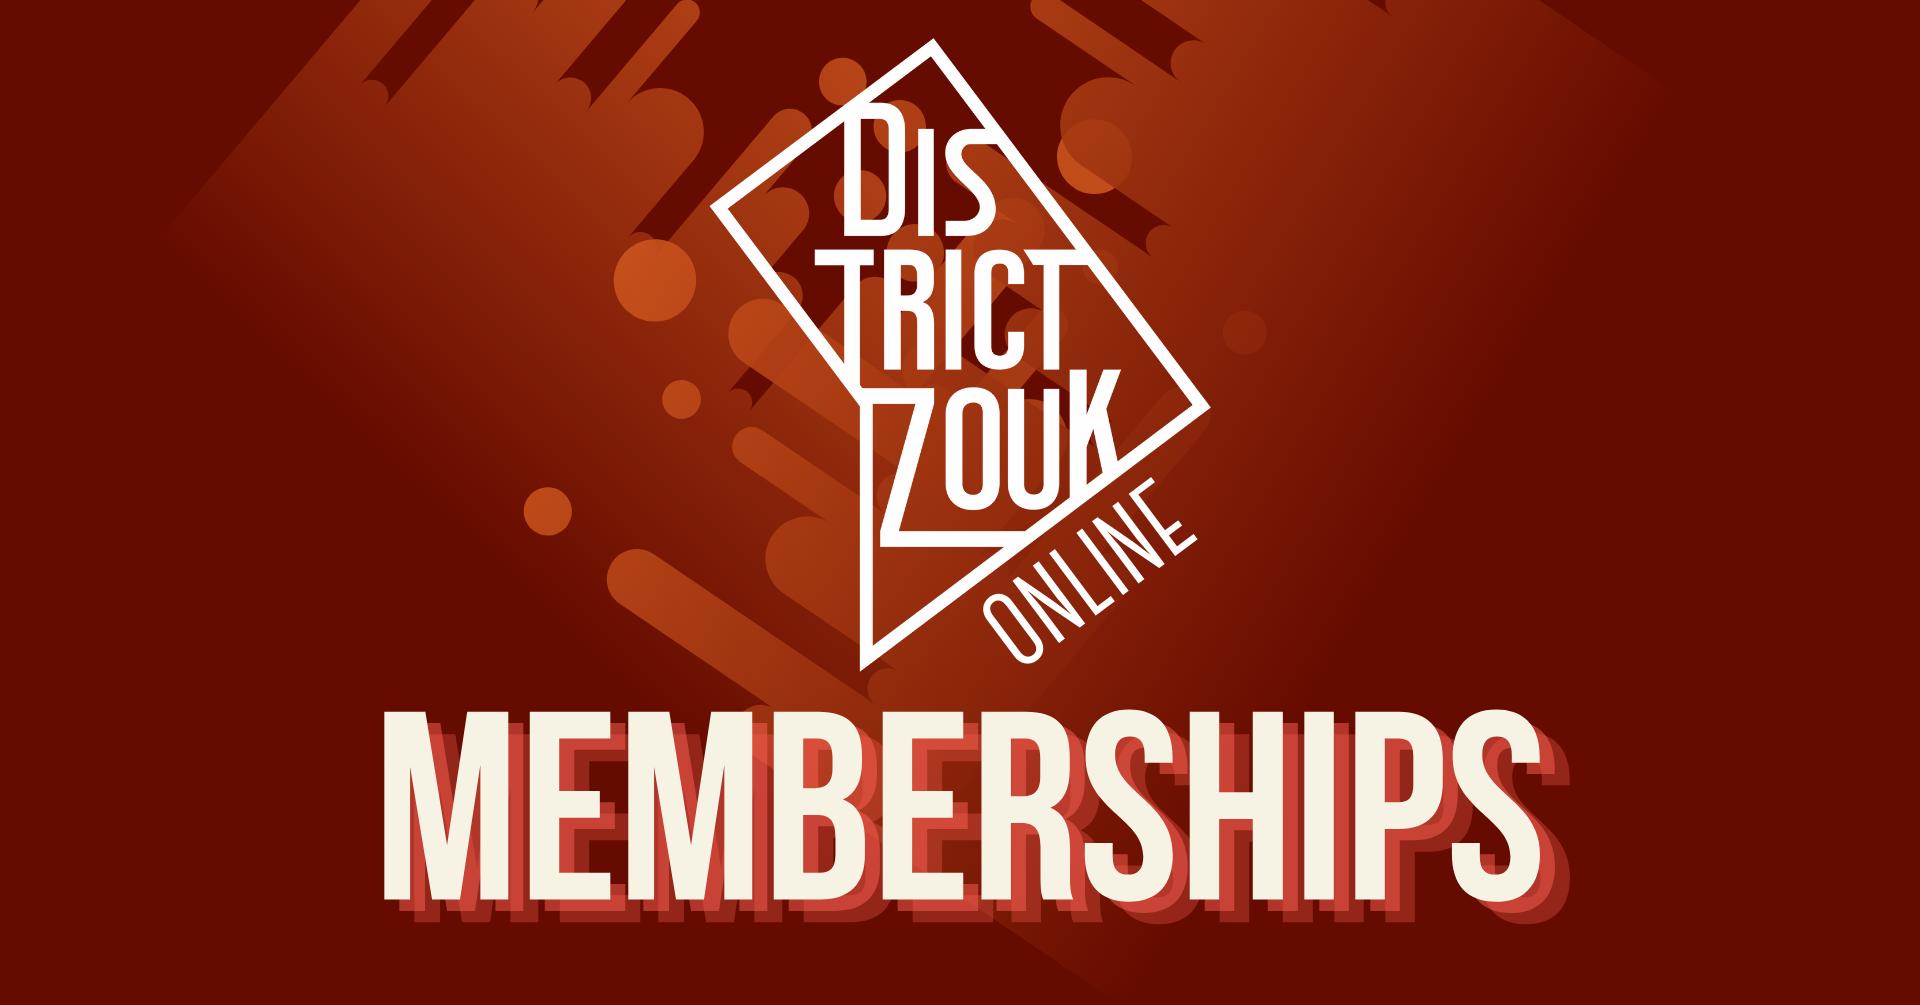 District Zouk Logo with Memberships written below